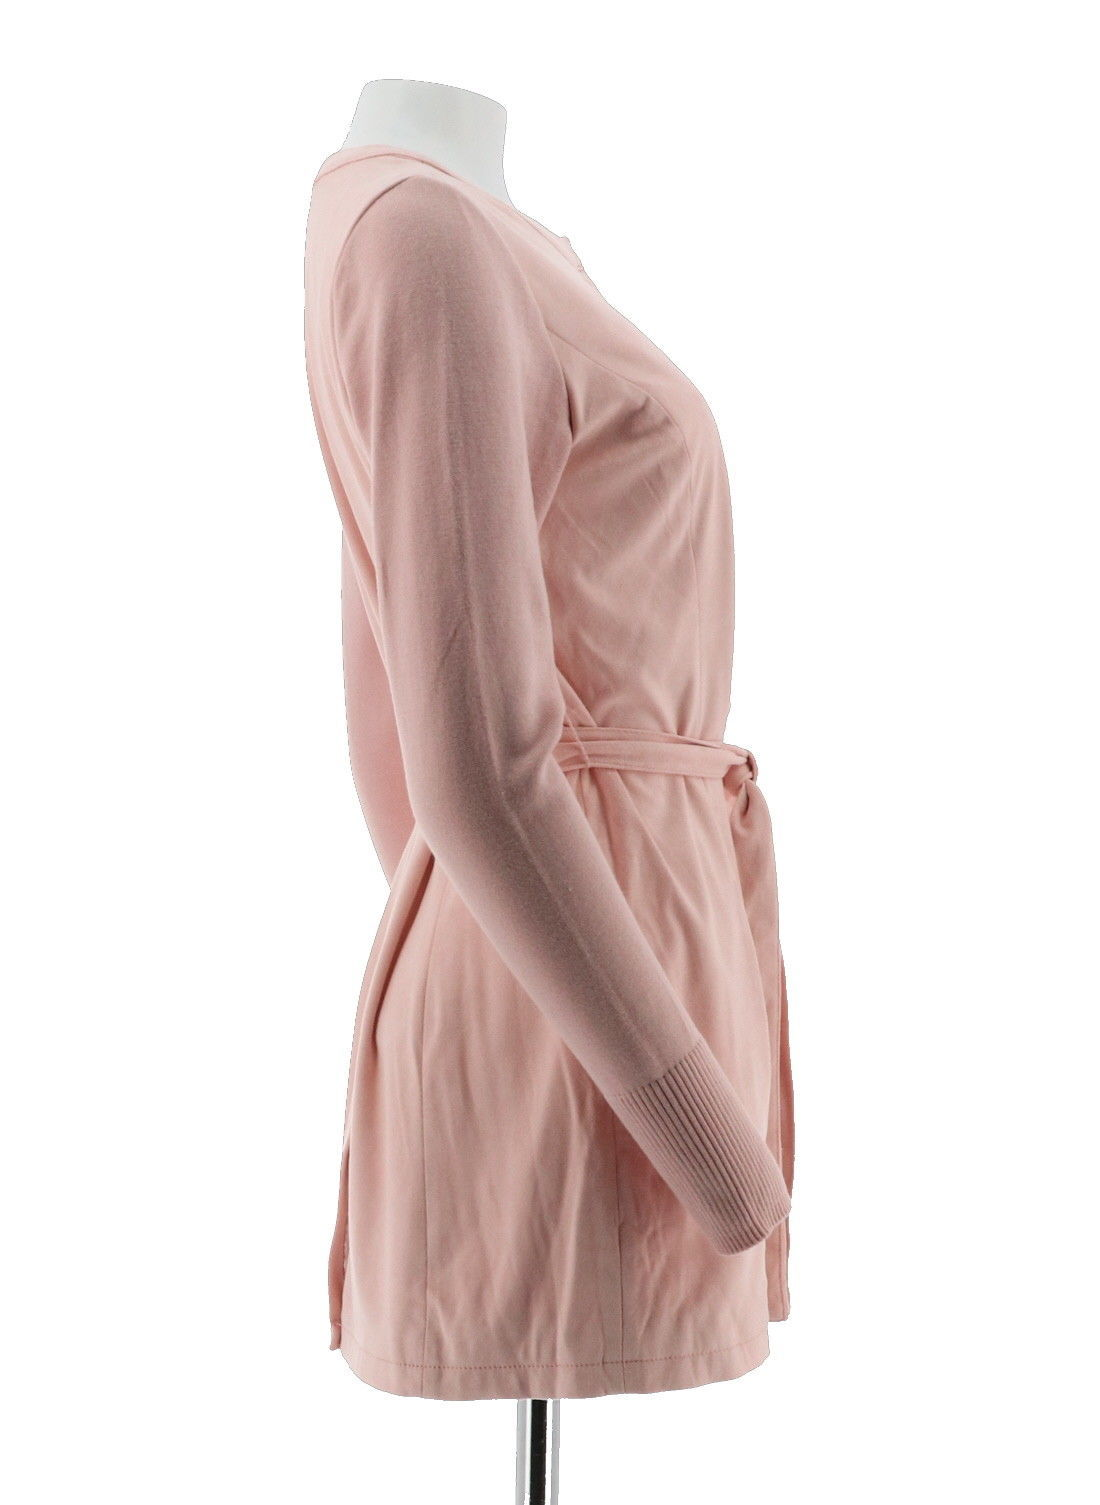 H Halston Faux Suede Jacket Sweater Knit Slvs Rose Blush 18W NEW A281814